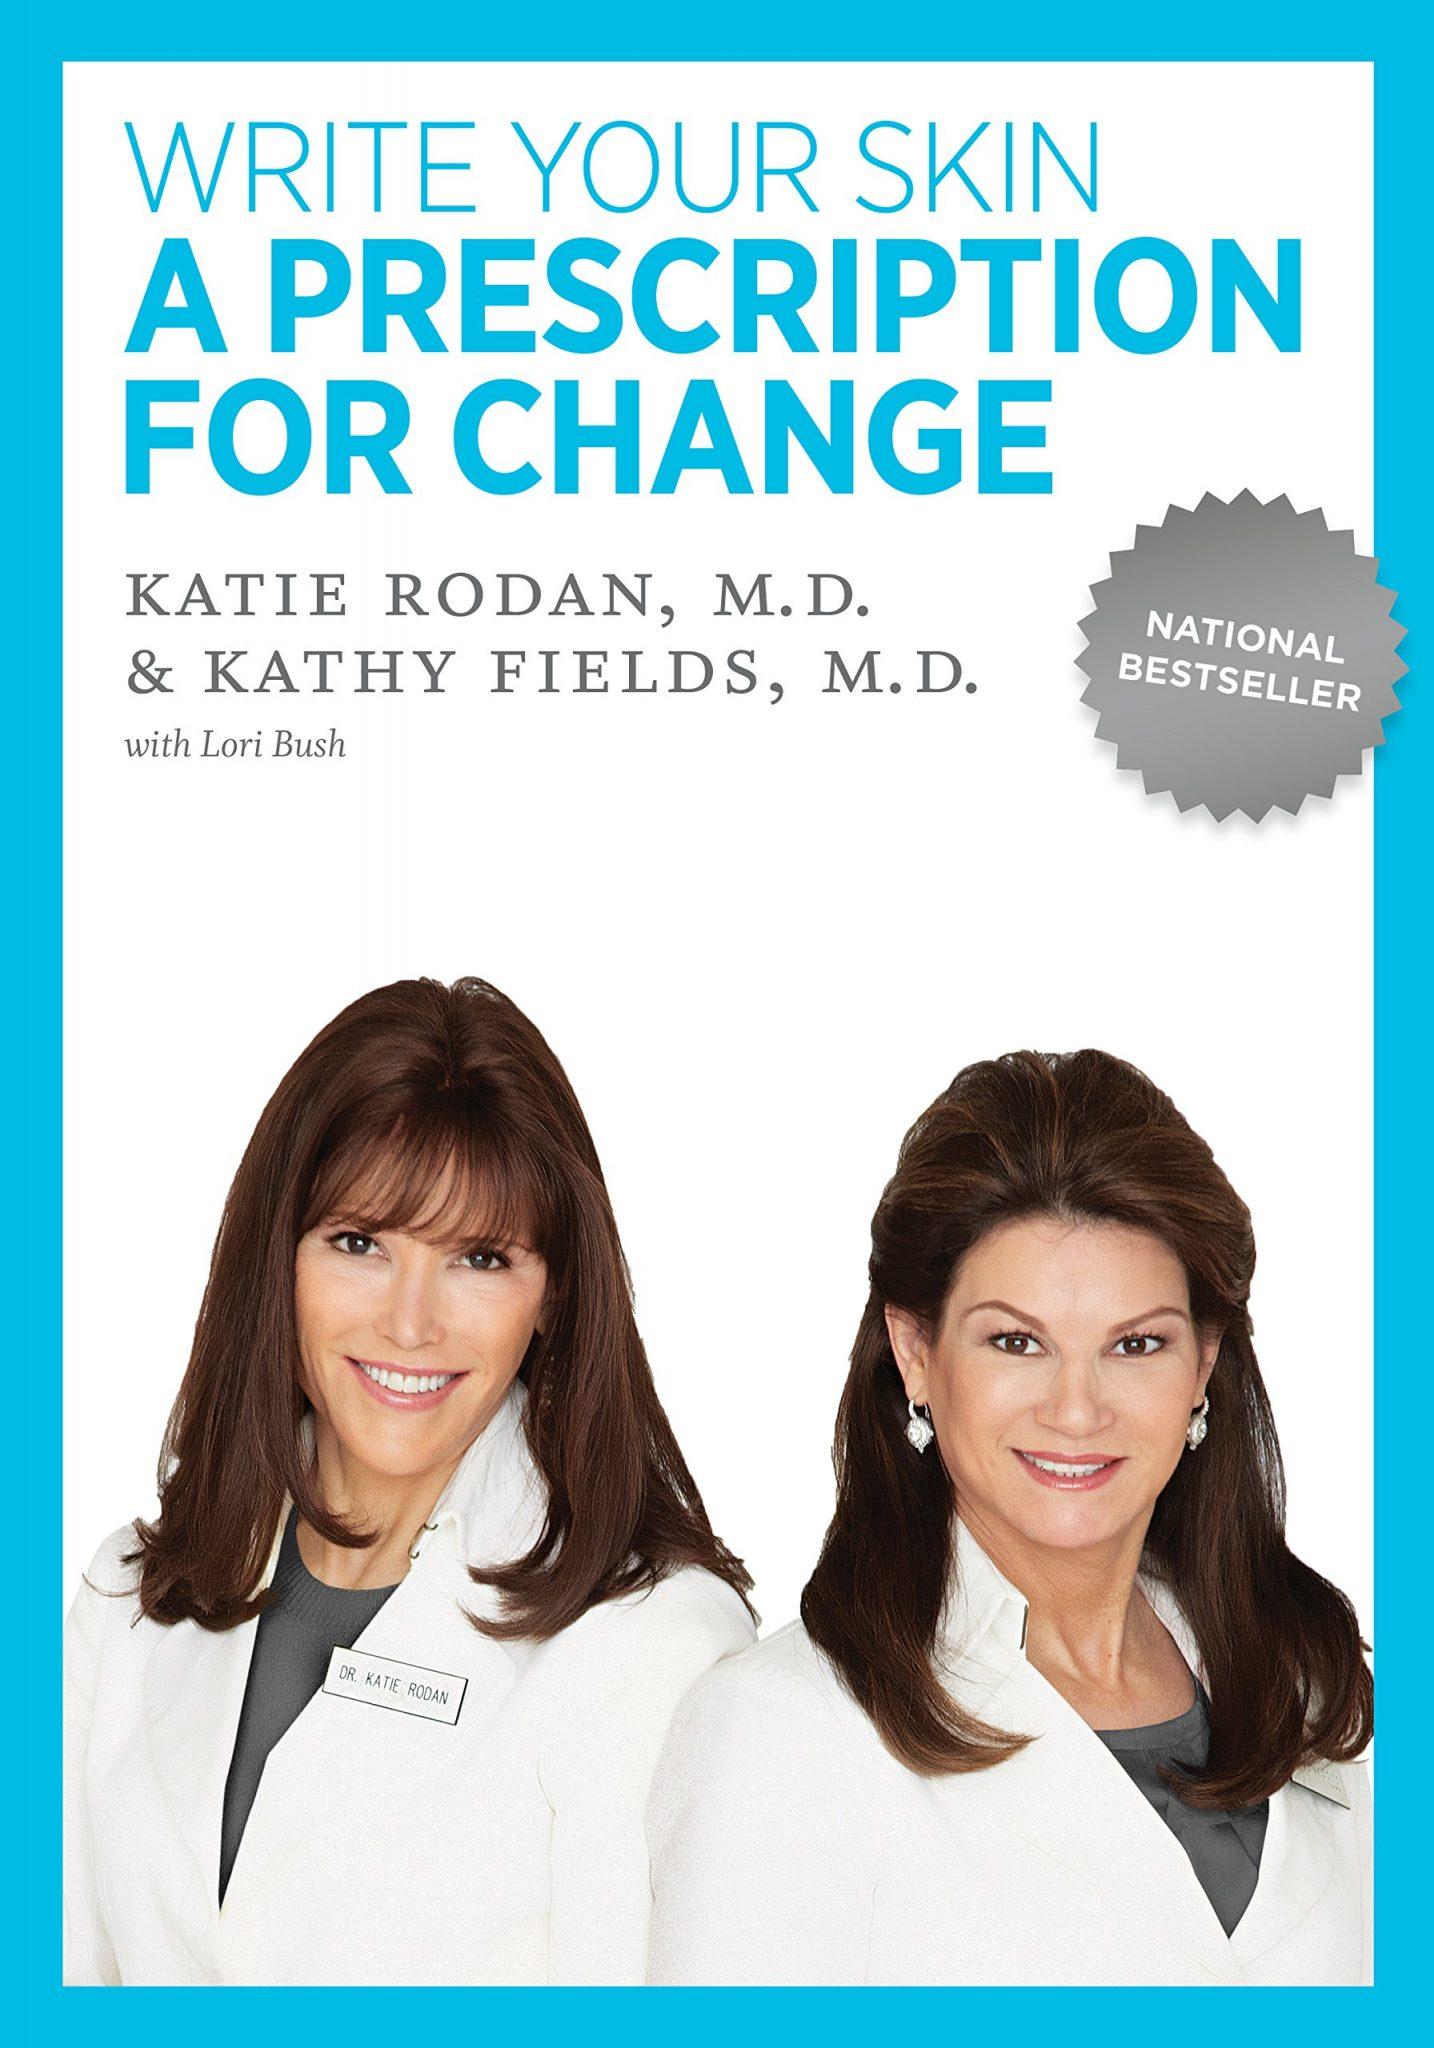 write-your-skin-a-prescription-for-change